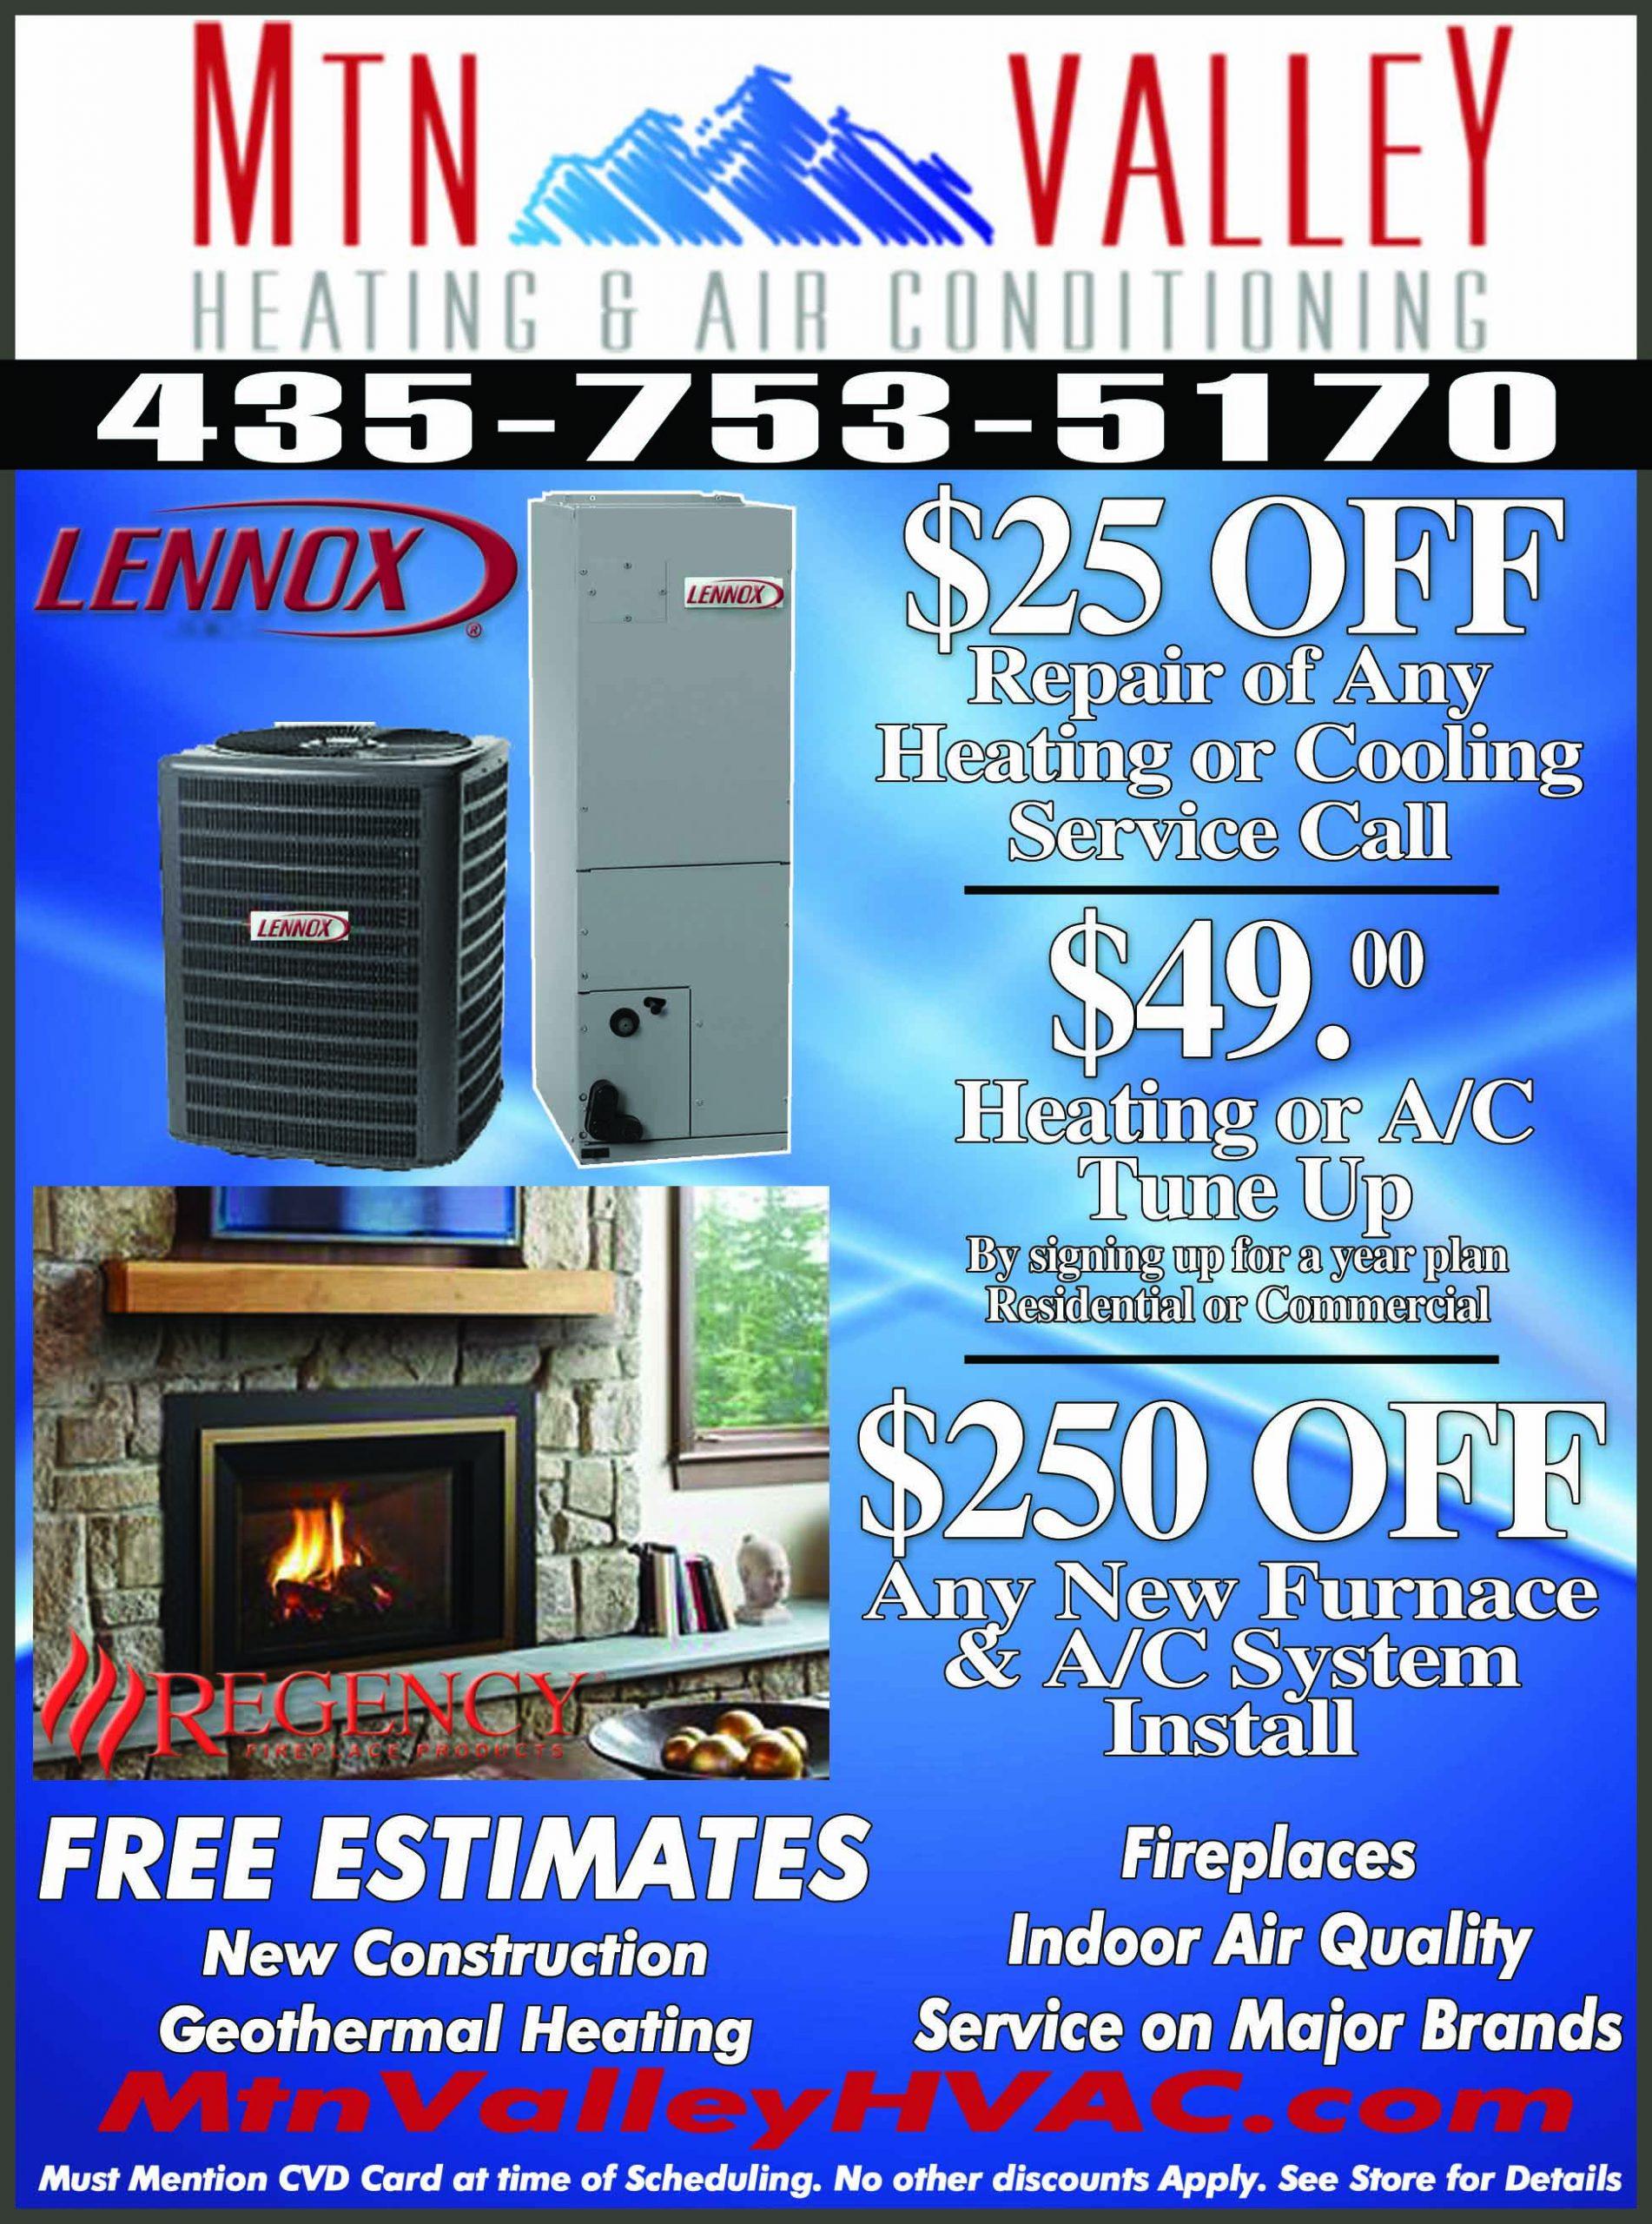 Mtn Valley Heating and Air Conditioning Logan Utah